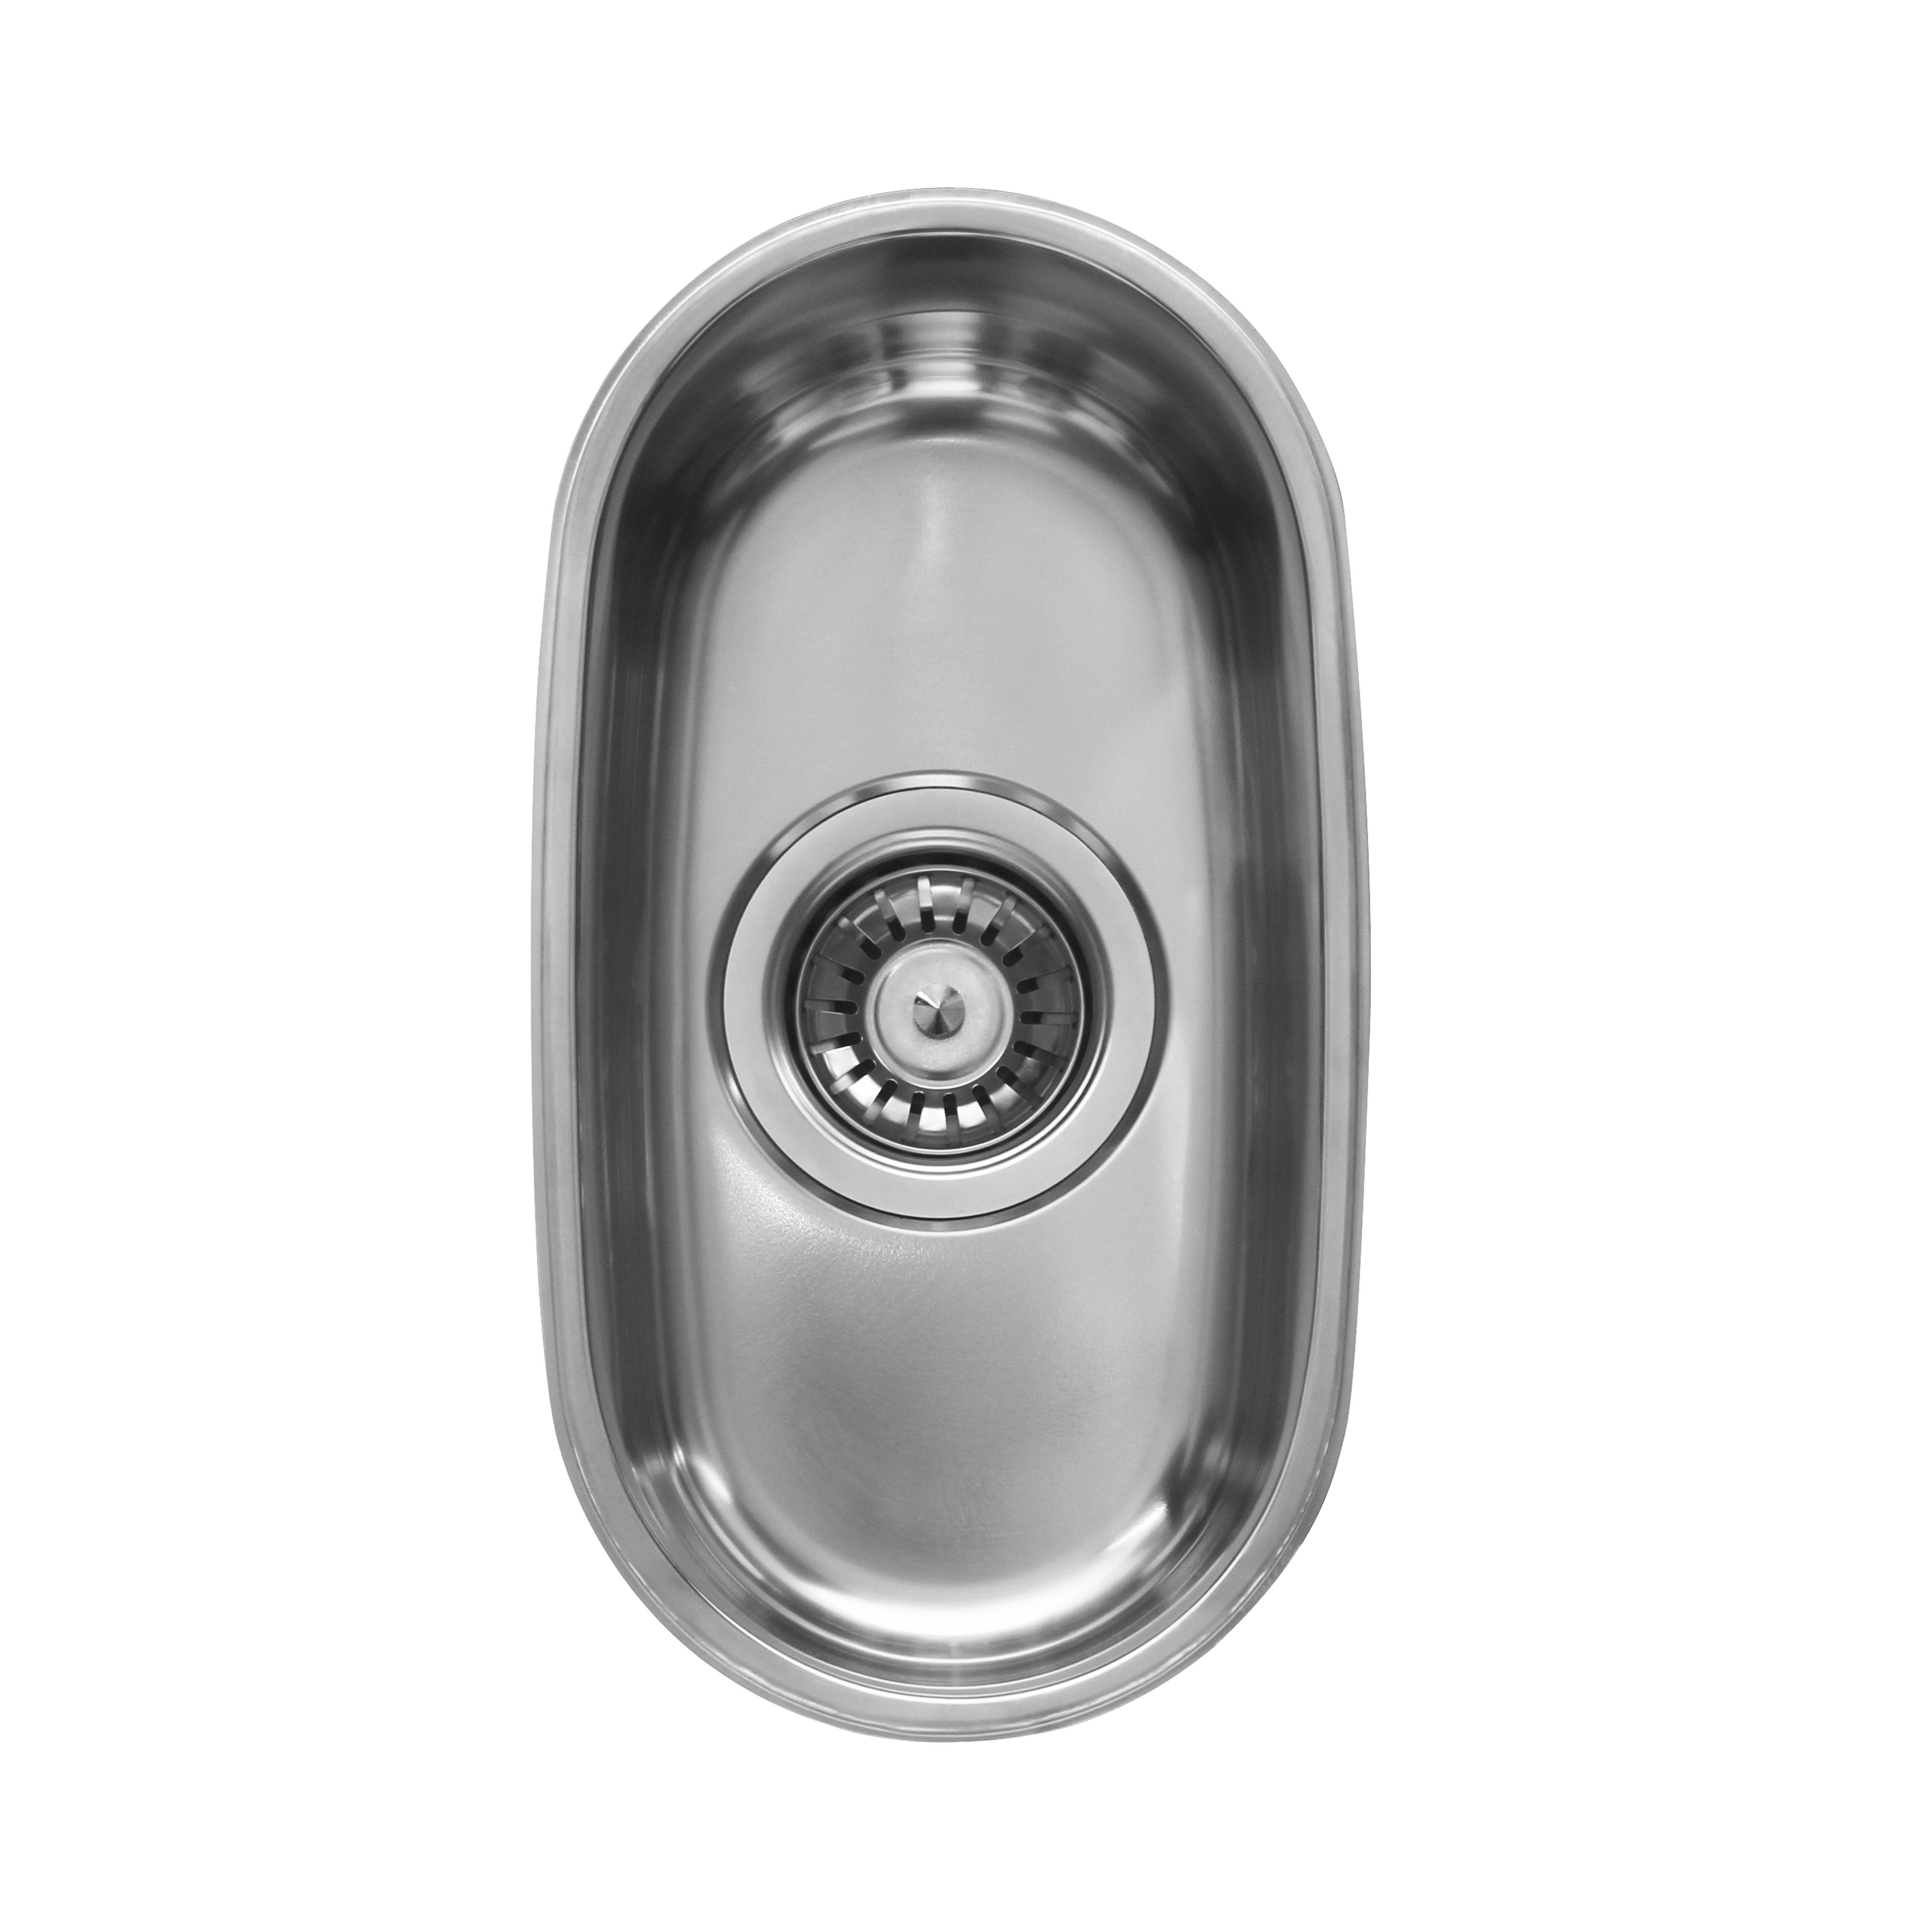 Ukinox D181 8 Inch Undermount Single Bowl Sink